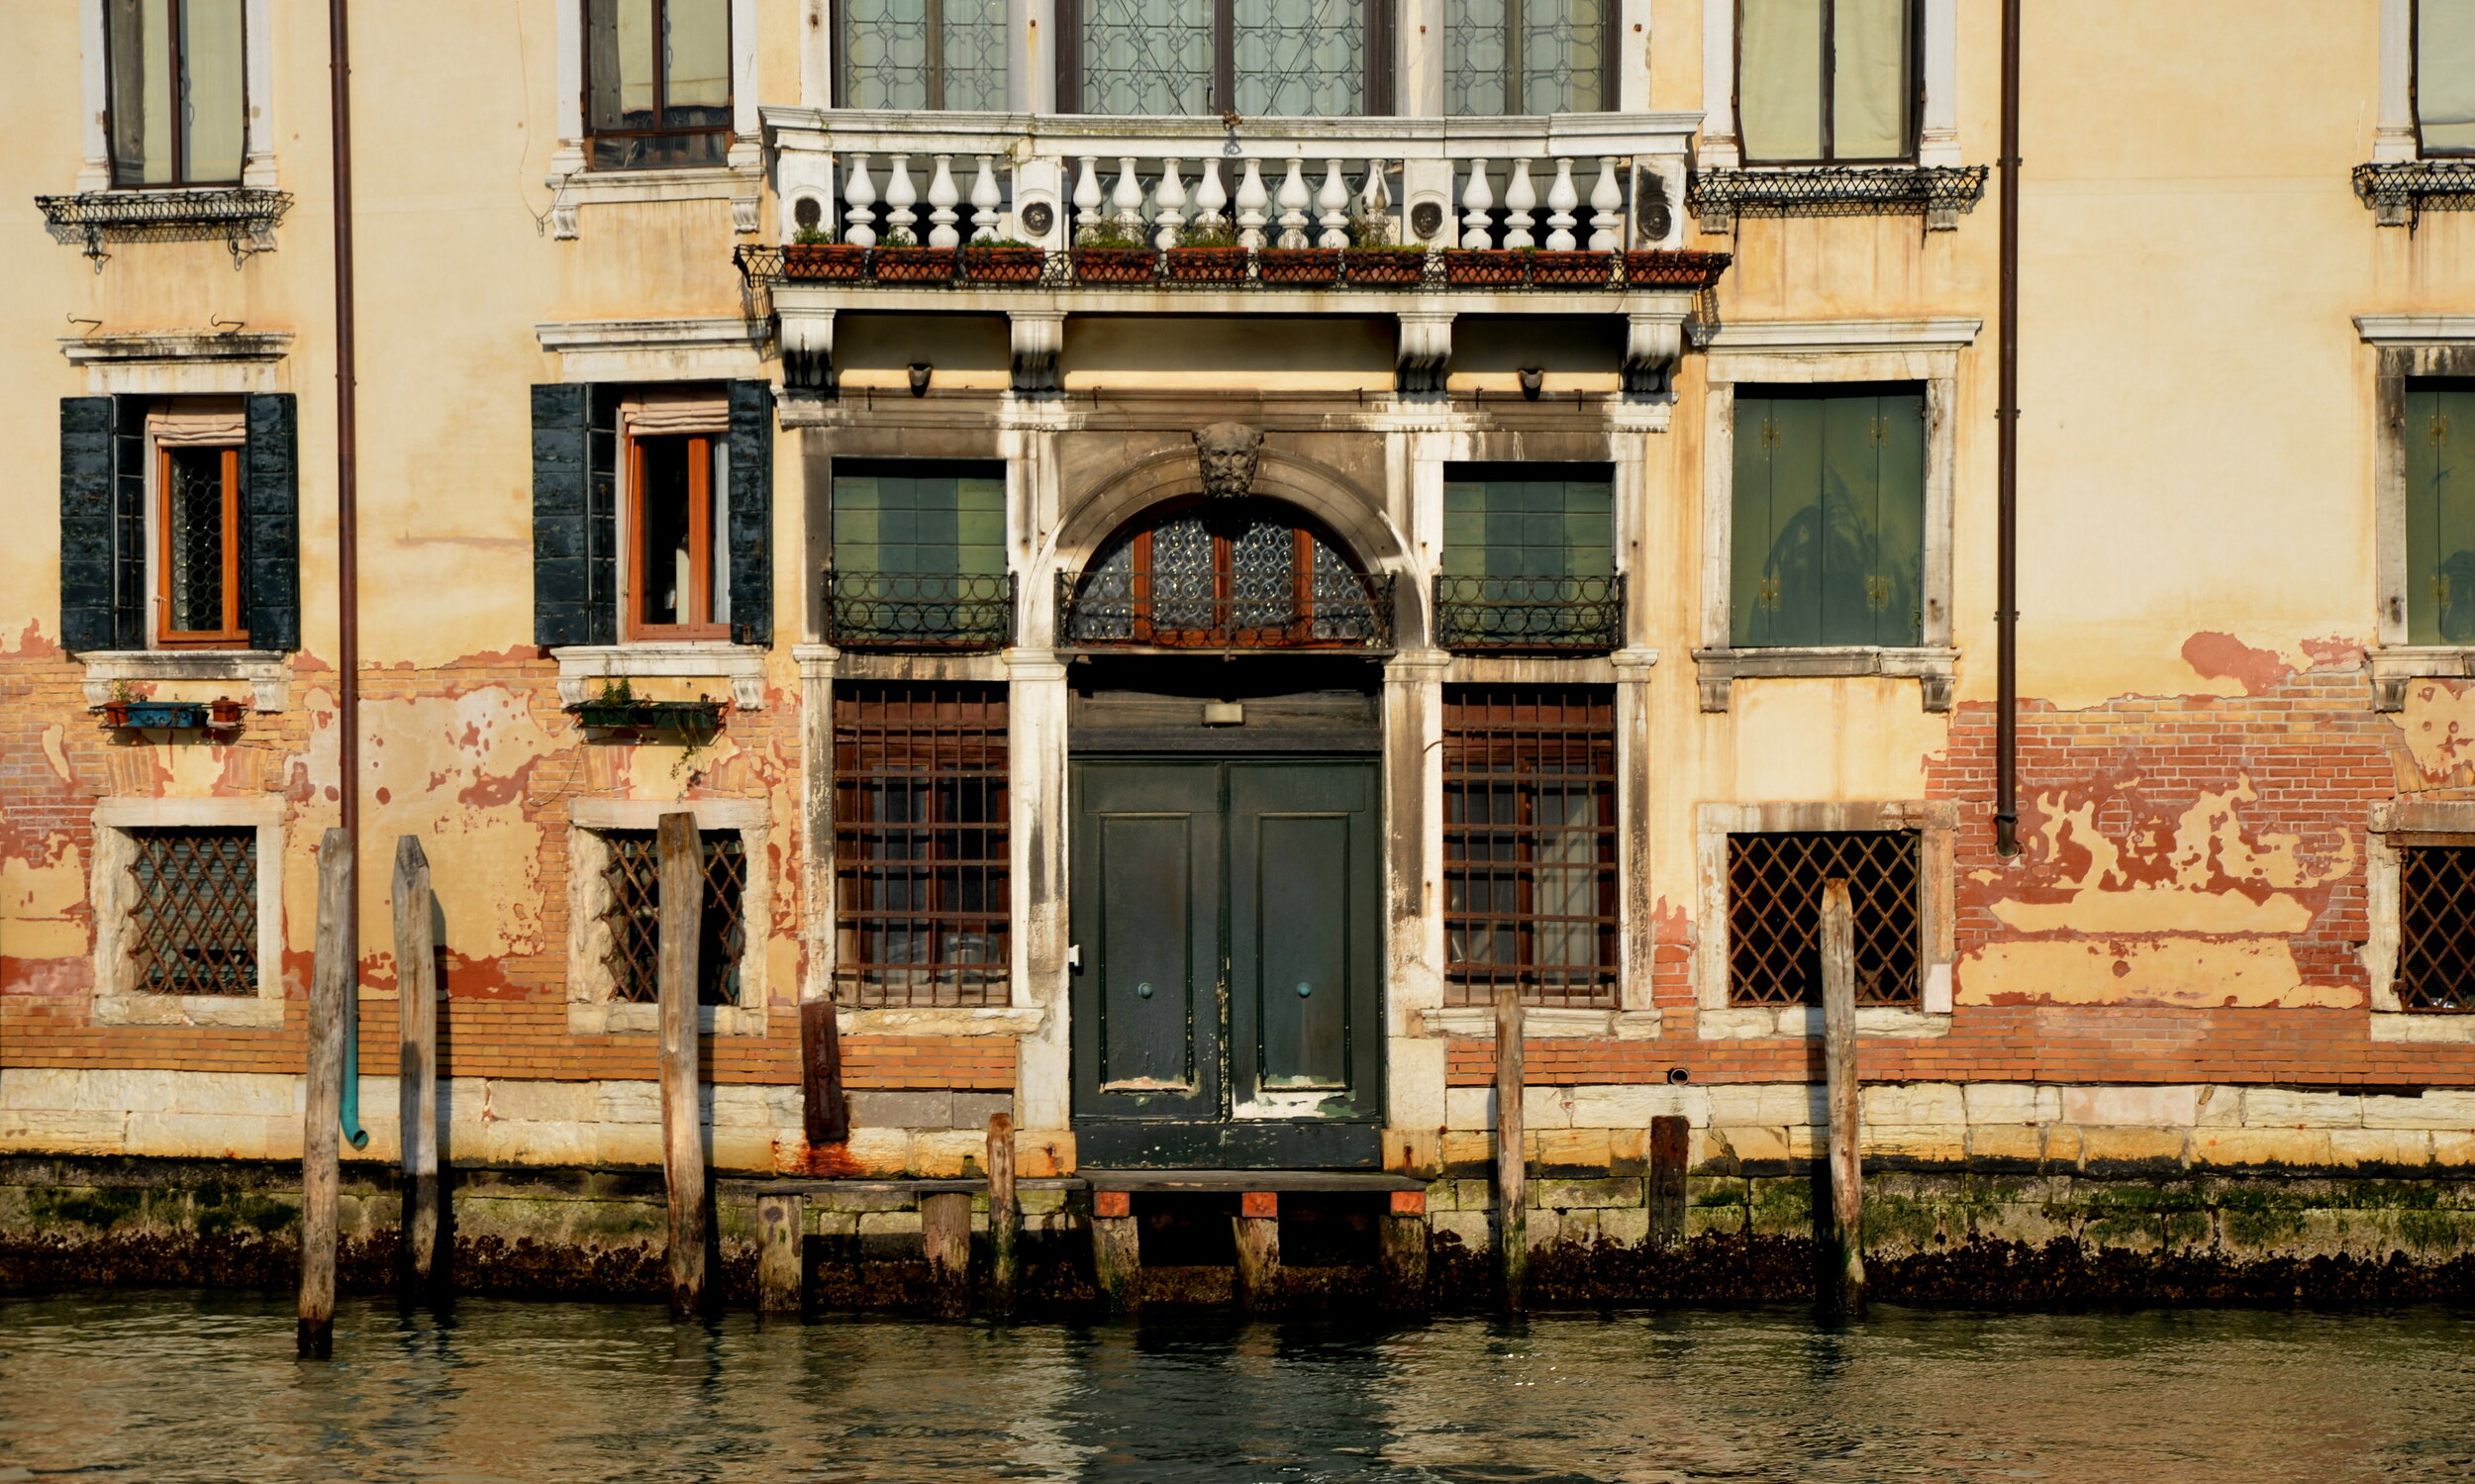 Decaying Palazzo, Venice